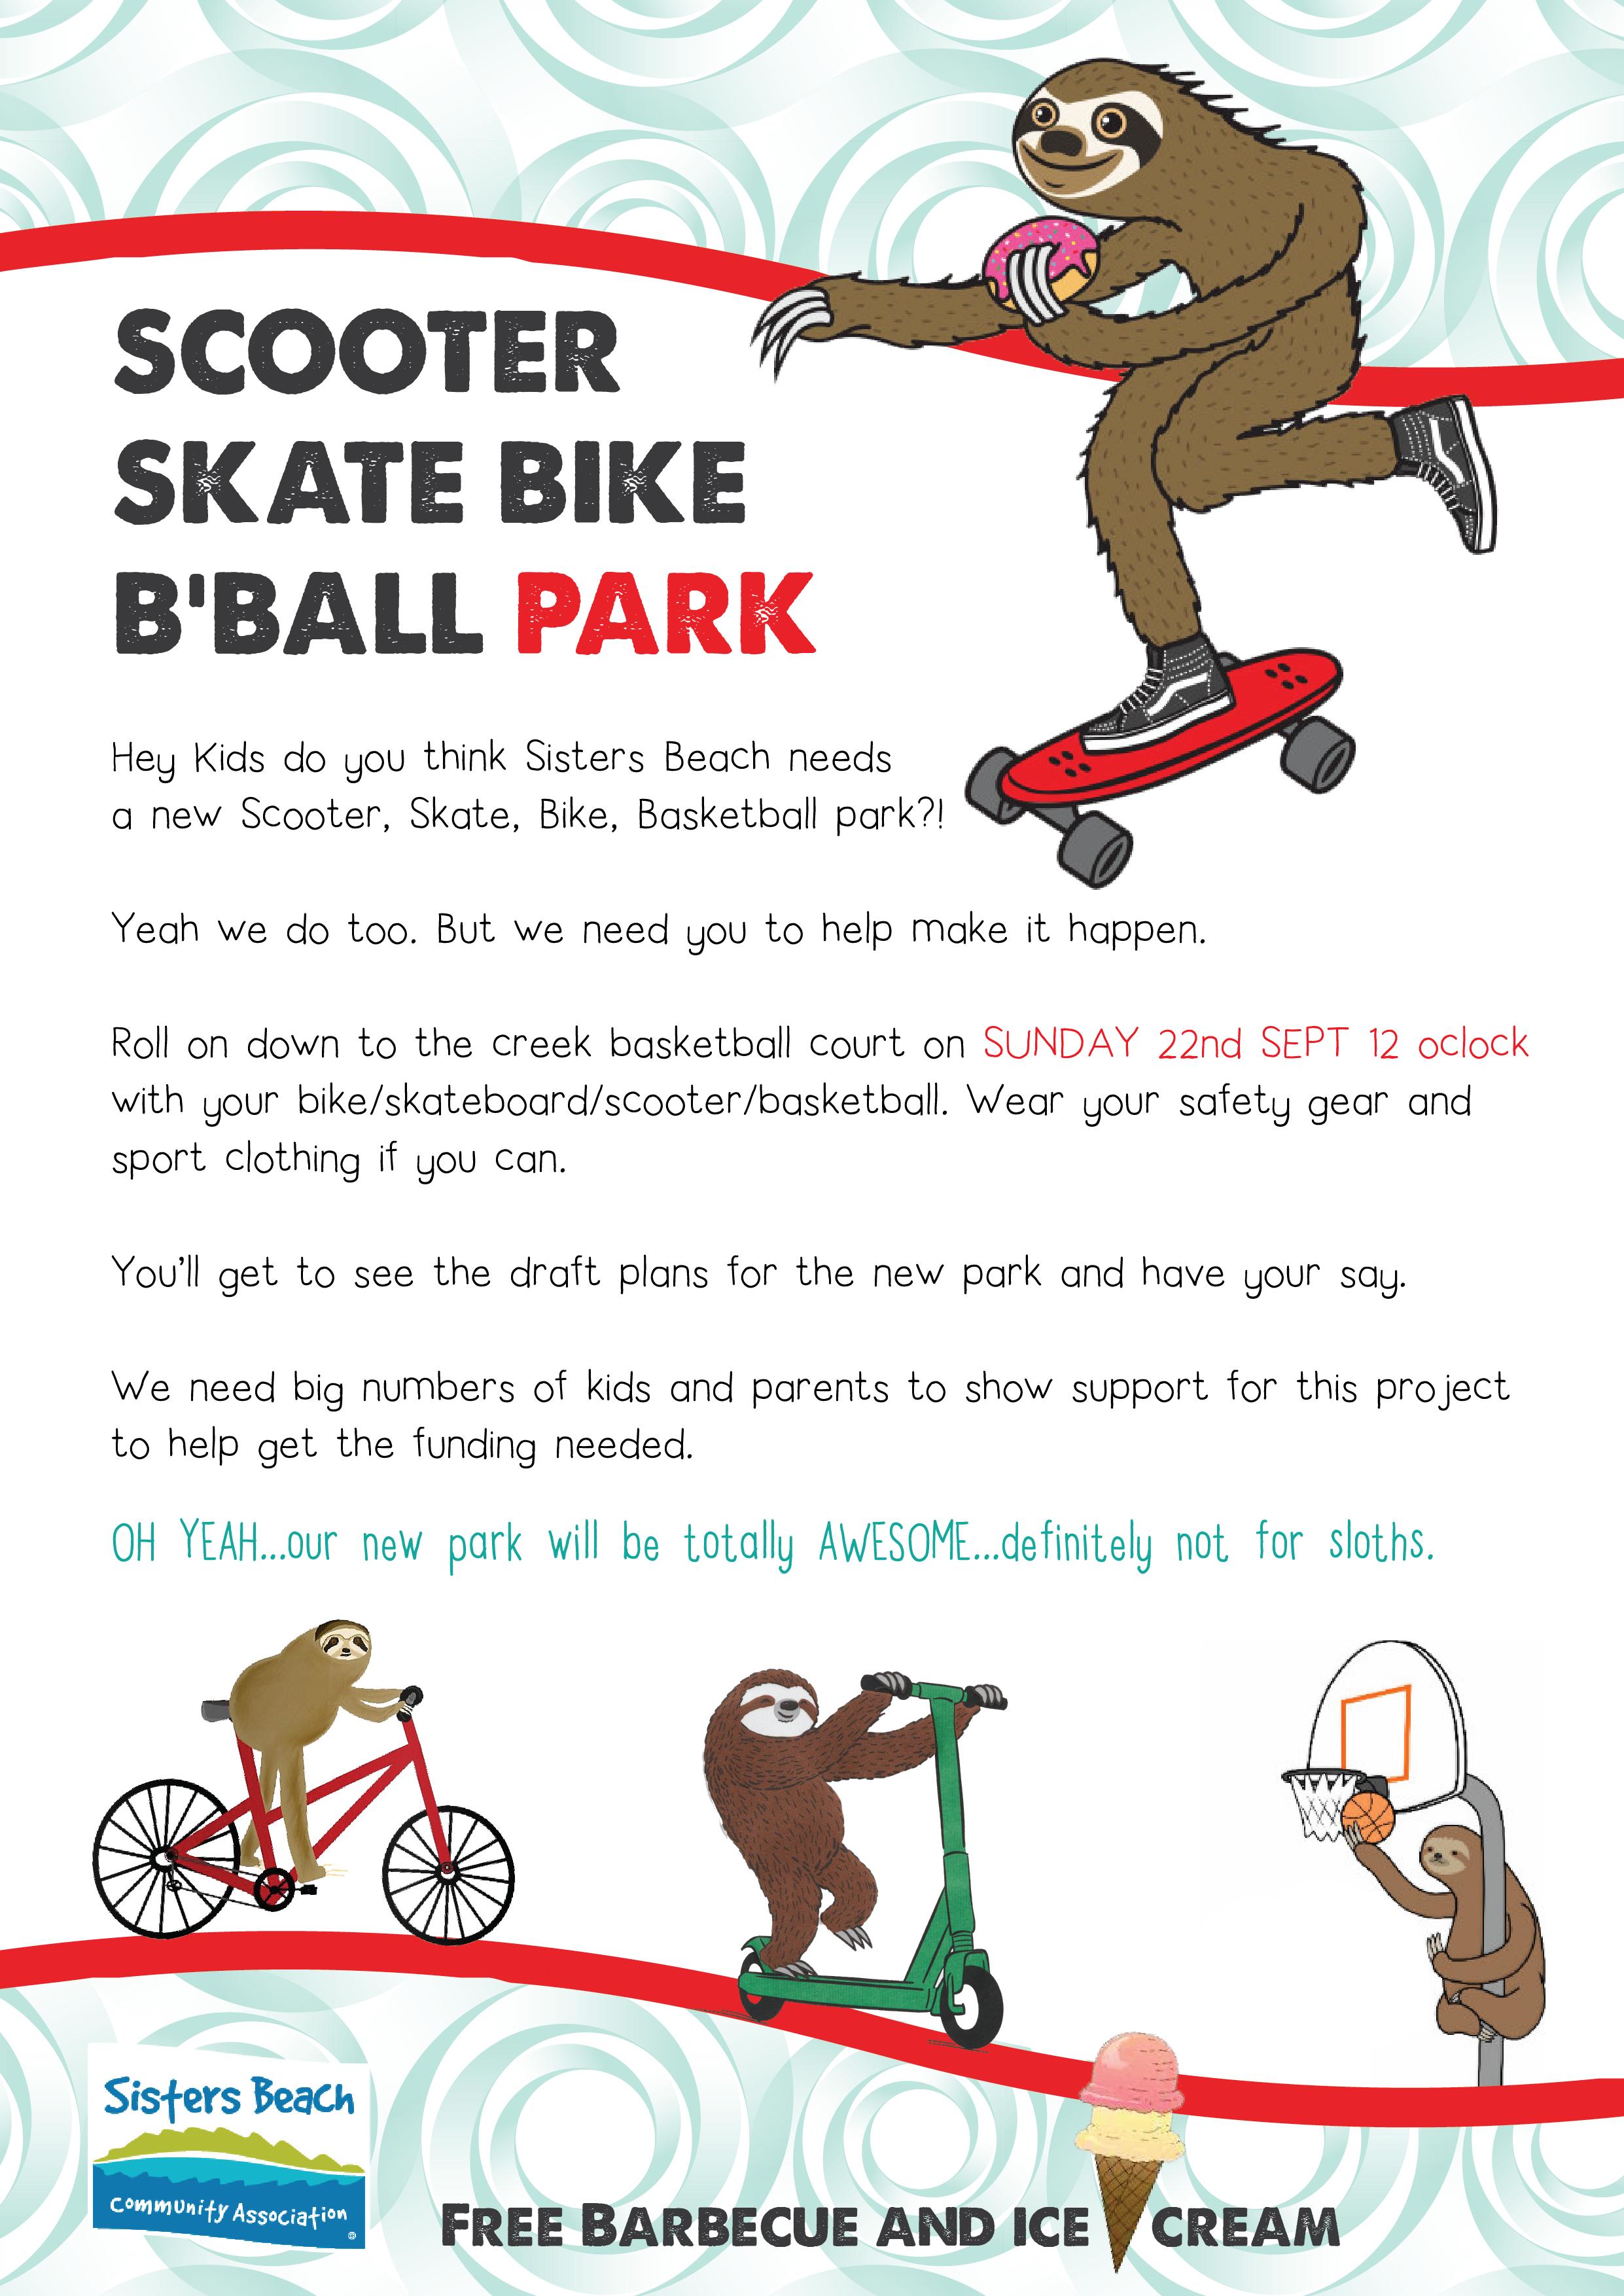 sisters beach scooter skate bike bball park